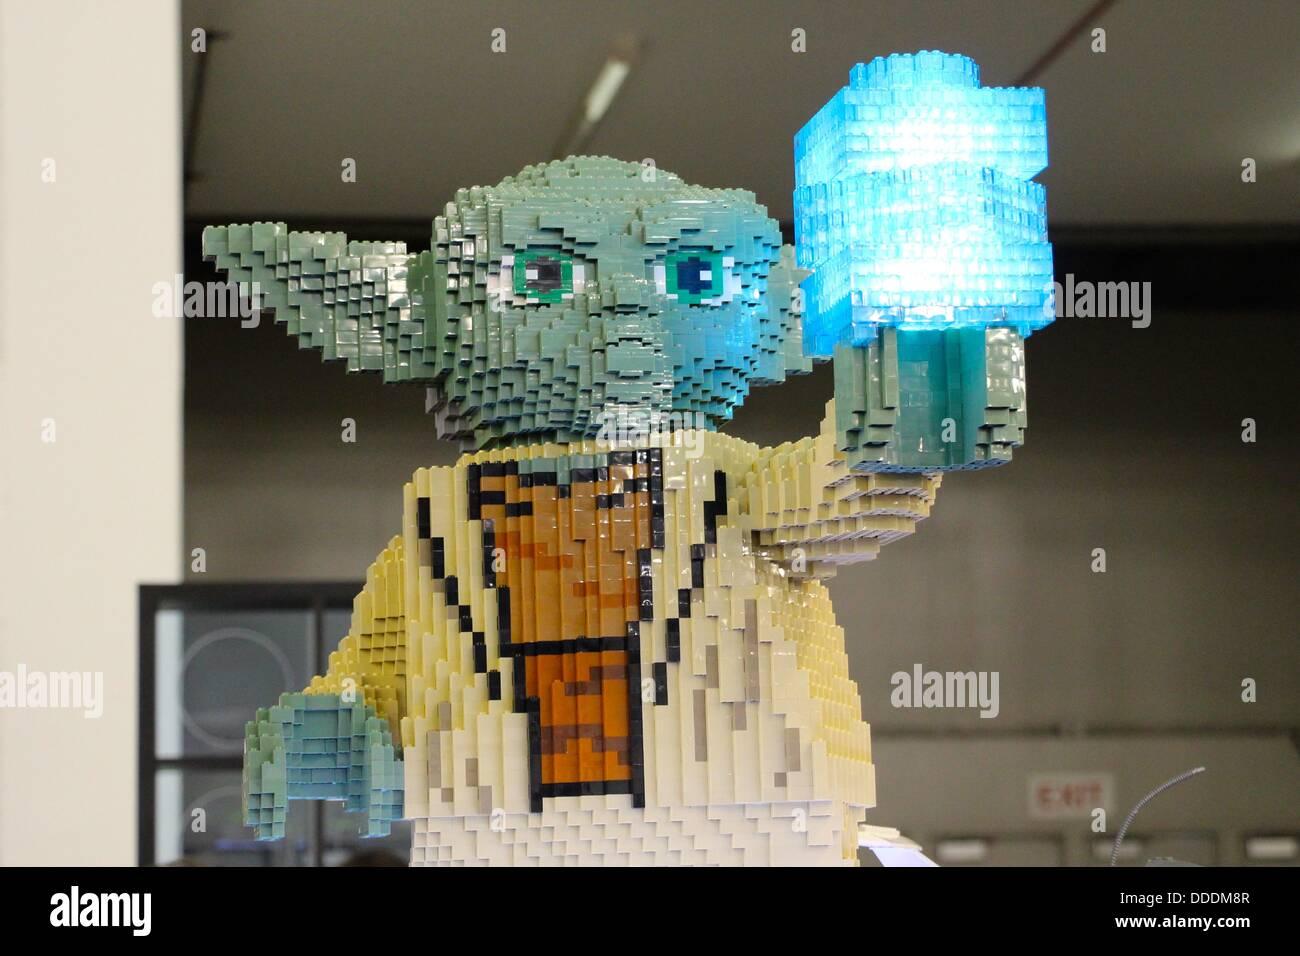 Star wars lego figuren stockfotos star wars lego figuren bilder alamy - Maitre yoda lego ...